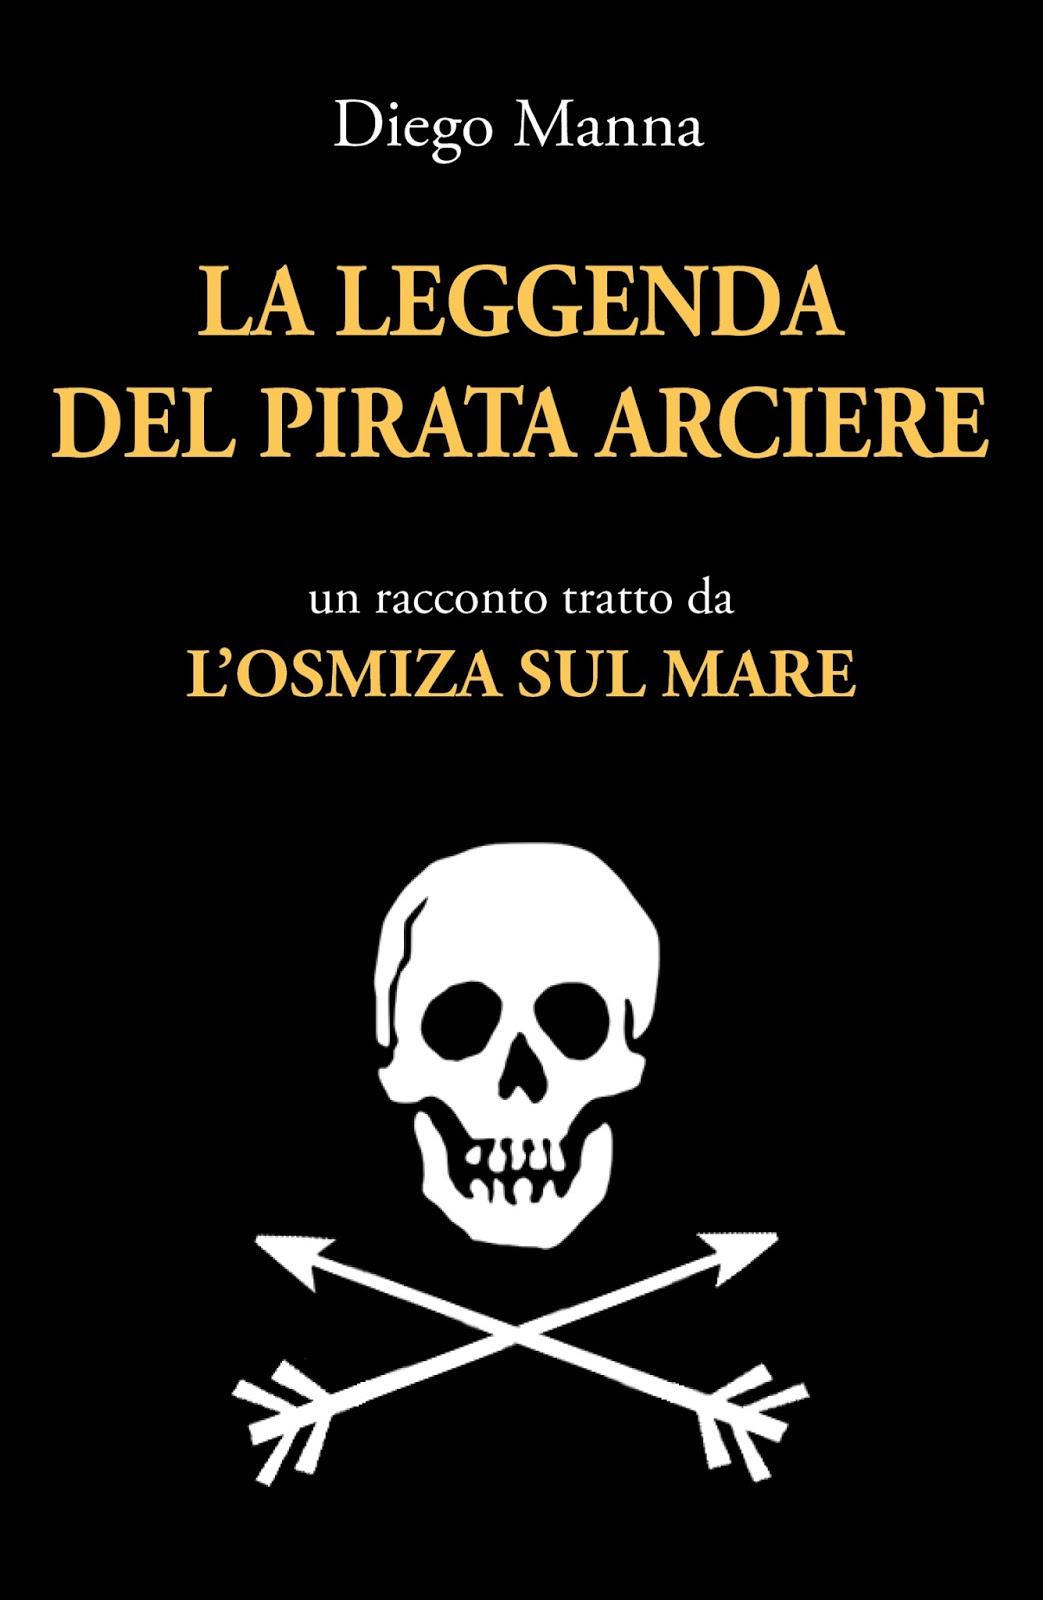 La leggenda del pirata nero 2003 full italian movie 3